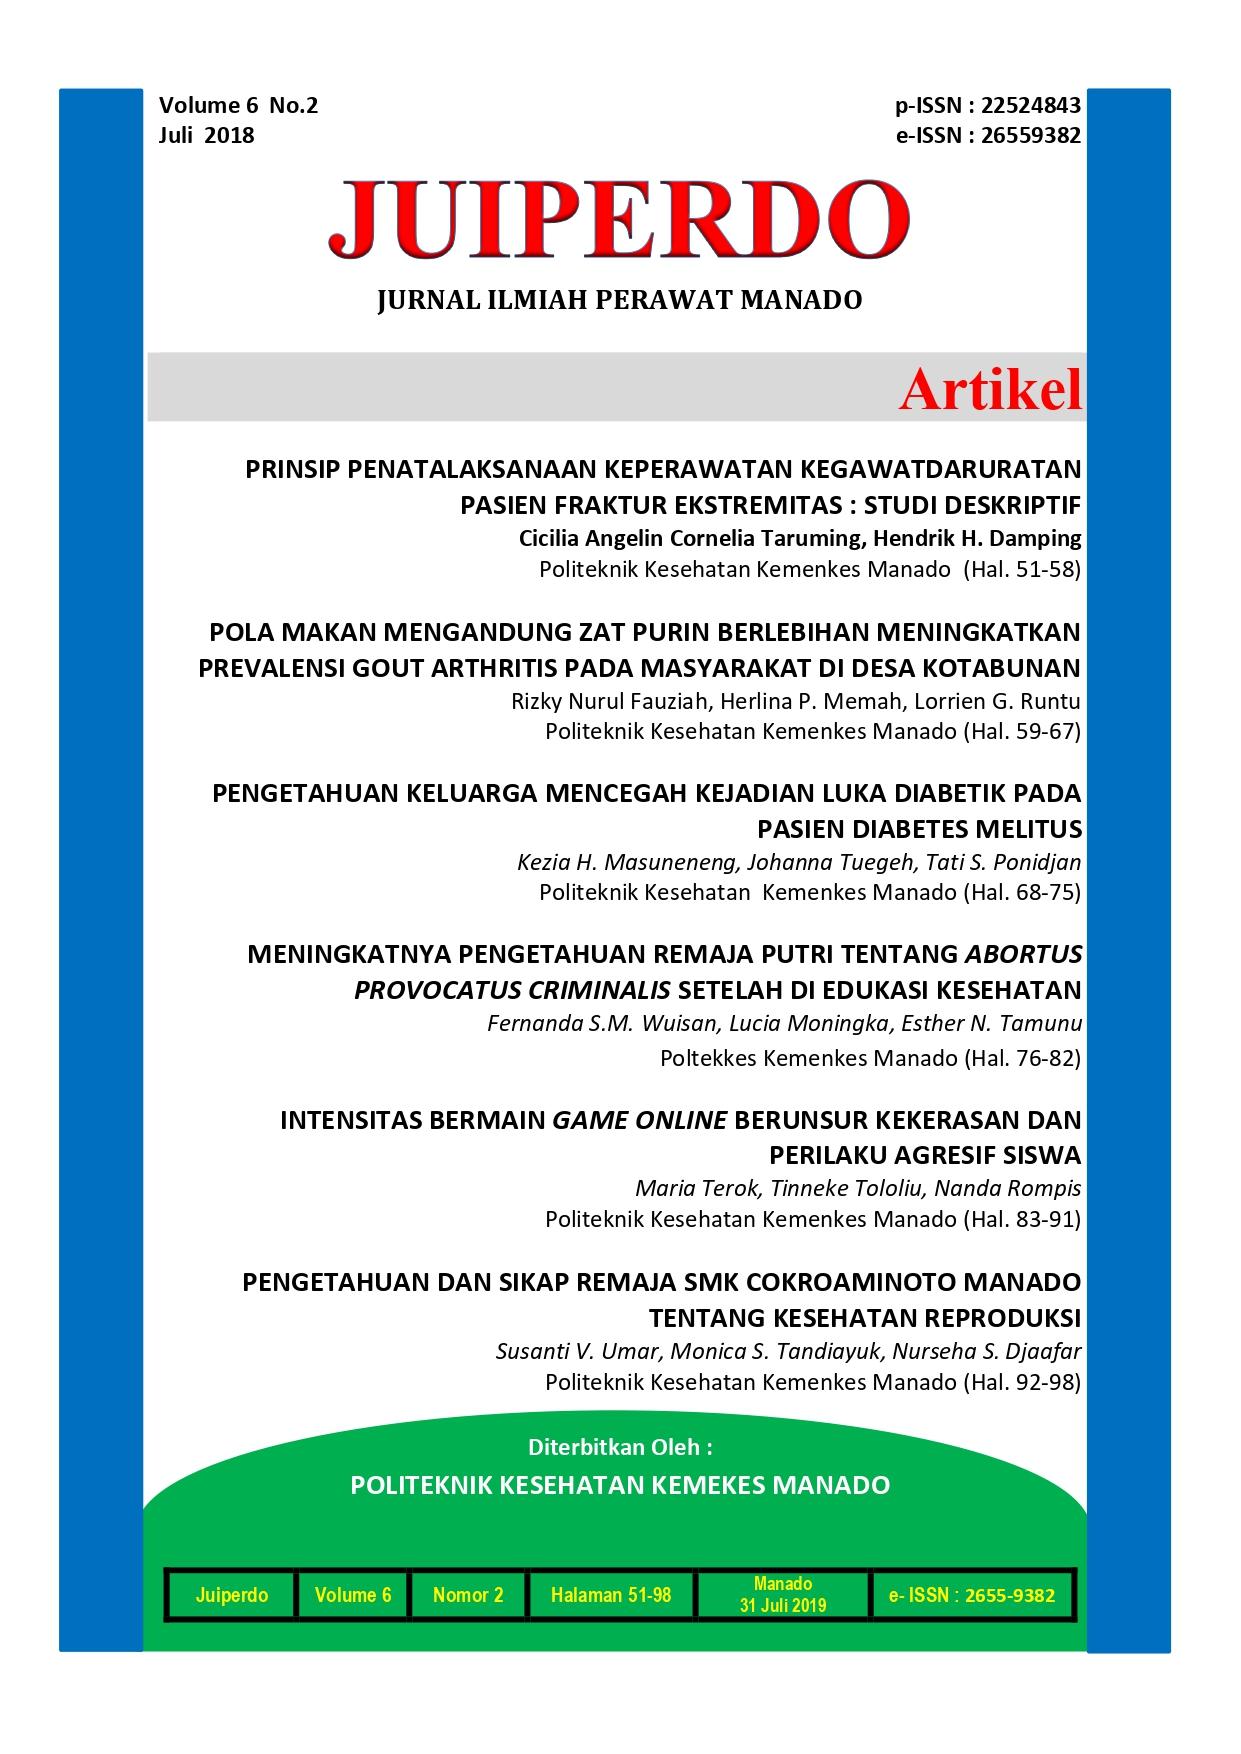 Knowledge Of Family Preventing Diabetic Wound In Diabetes Melitus Patient Jurnal Ilmiah Perawat Manado Juiperdo